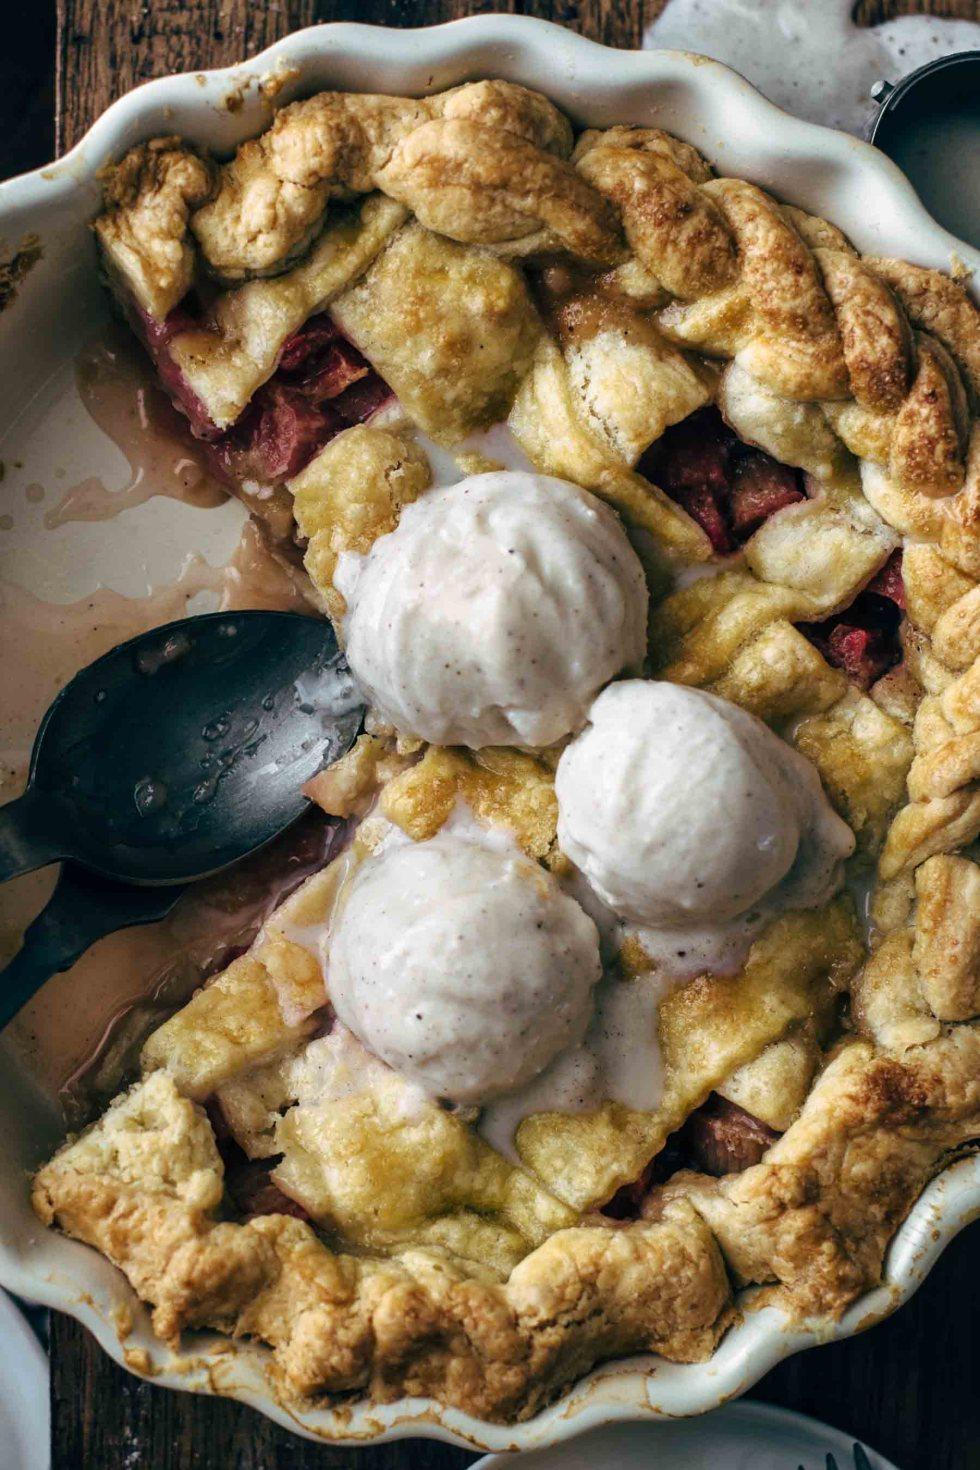 Easy Rhubarb Pie Recipe from scratch